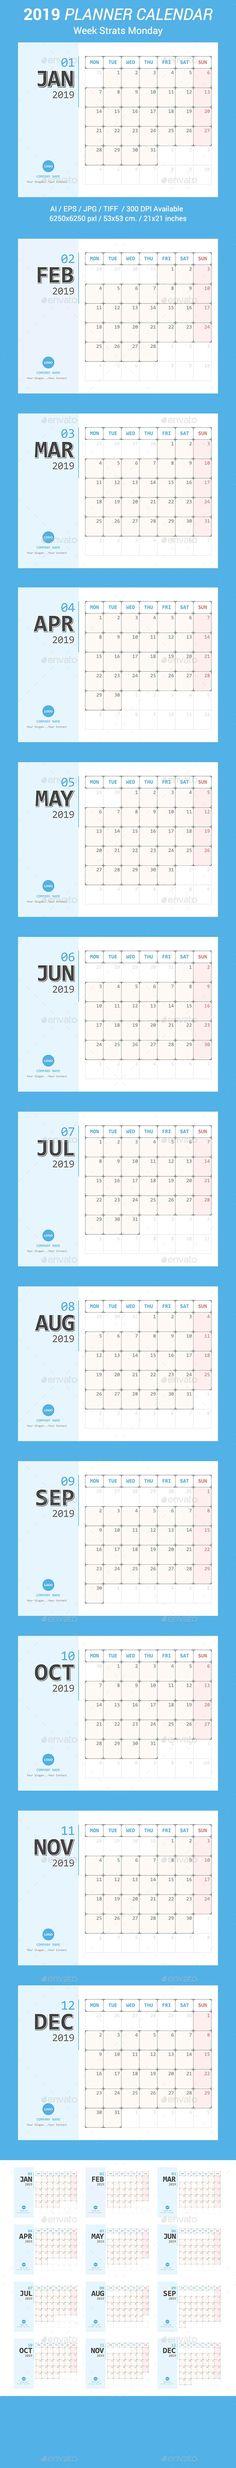 by ctrlaplus on GraphicRiver. Calendar 2019 Planner, Office Calendar, Desk Calendars, Stationery Templates, Stationery Design, Print Templates, Calendar Templates, Anime Artwork, Graphic Design